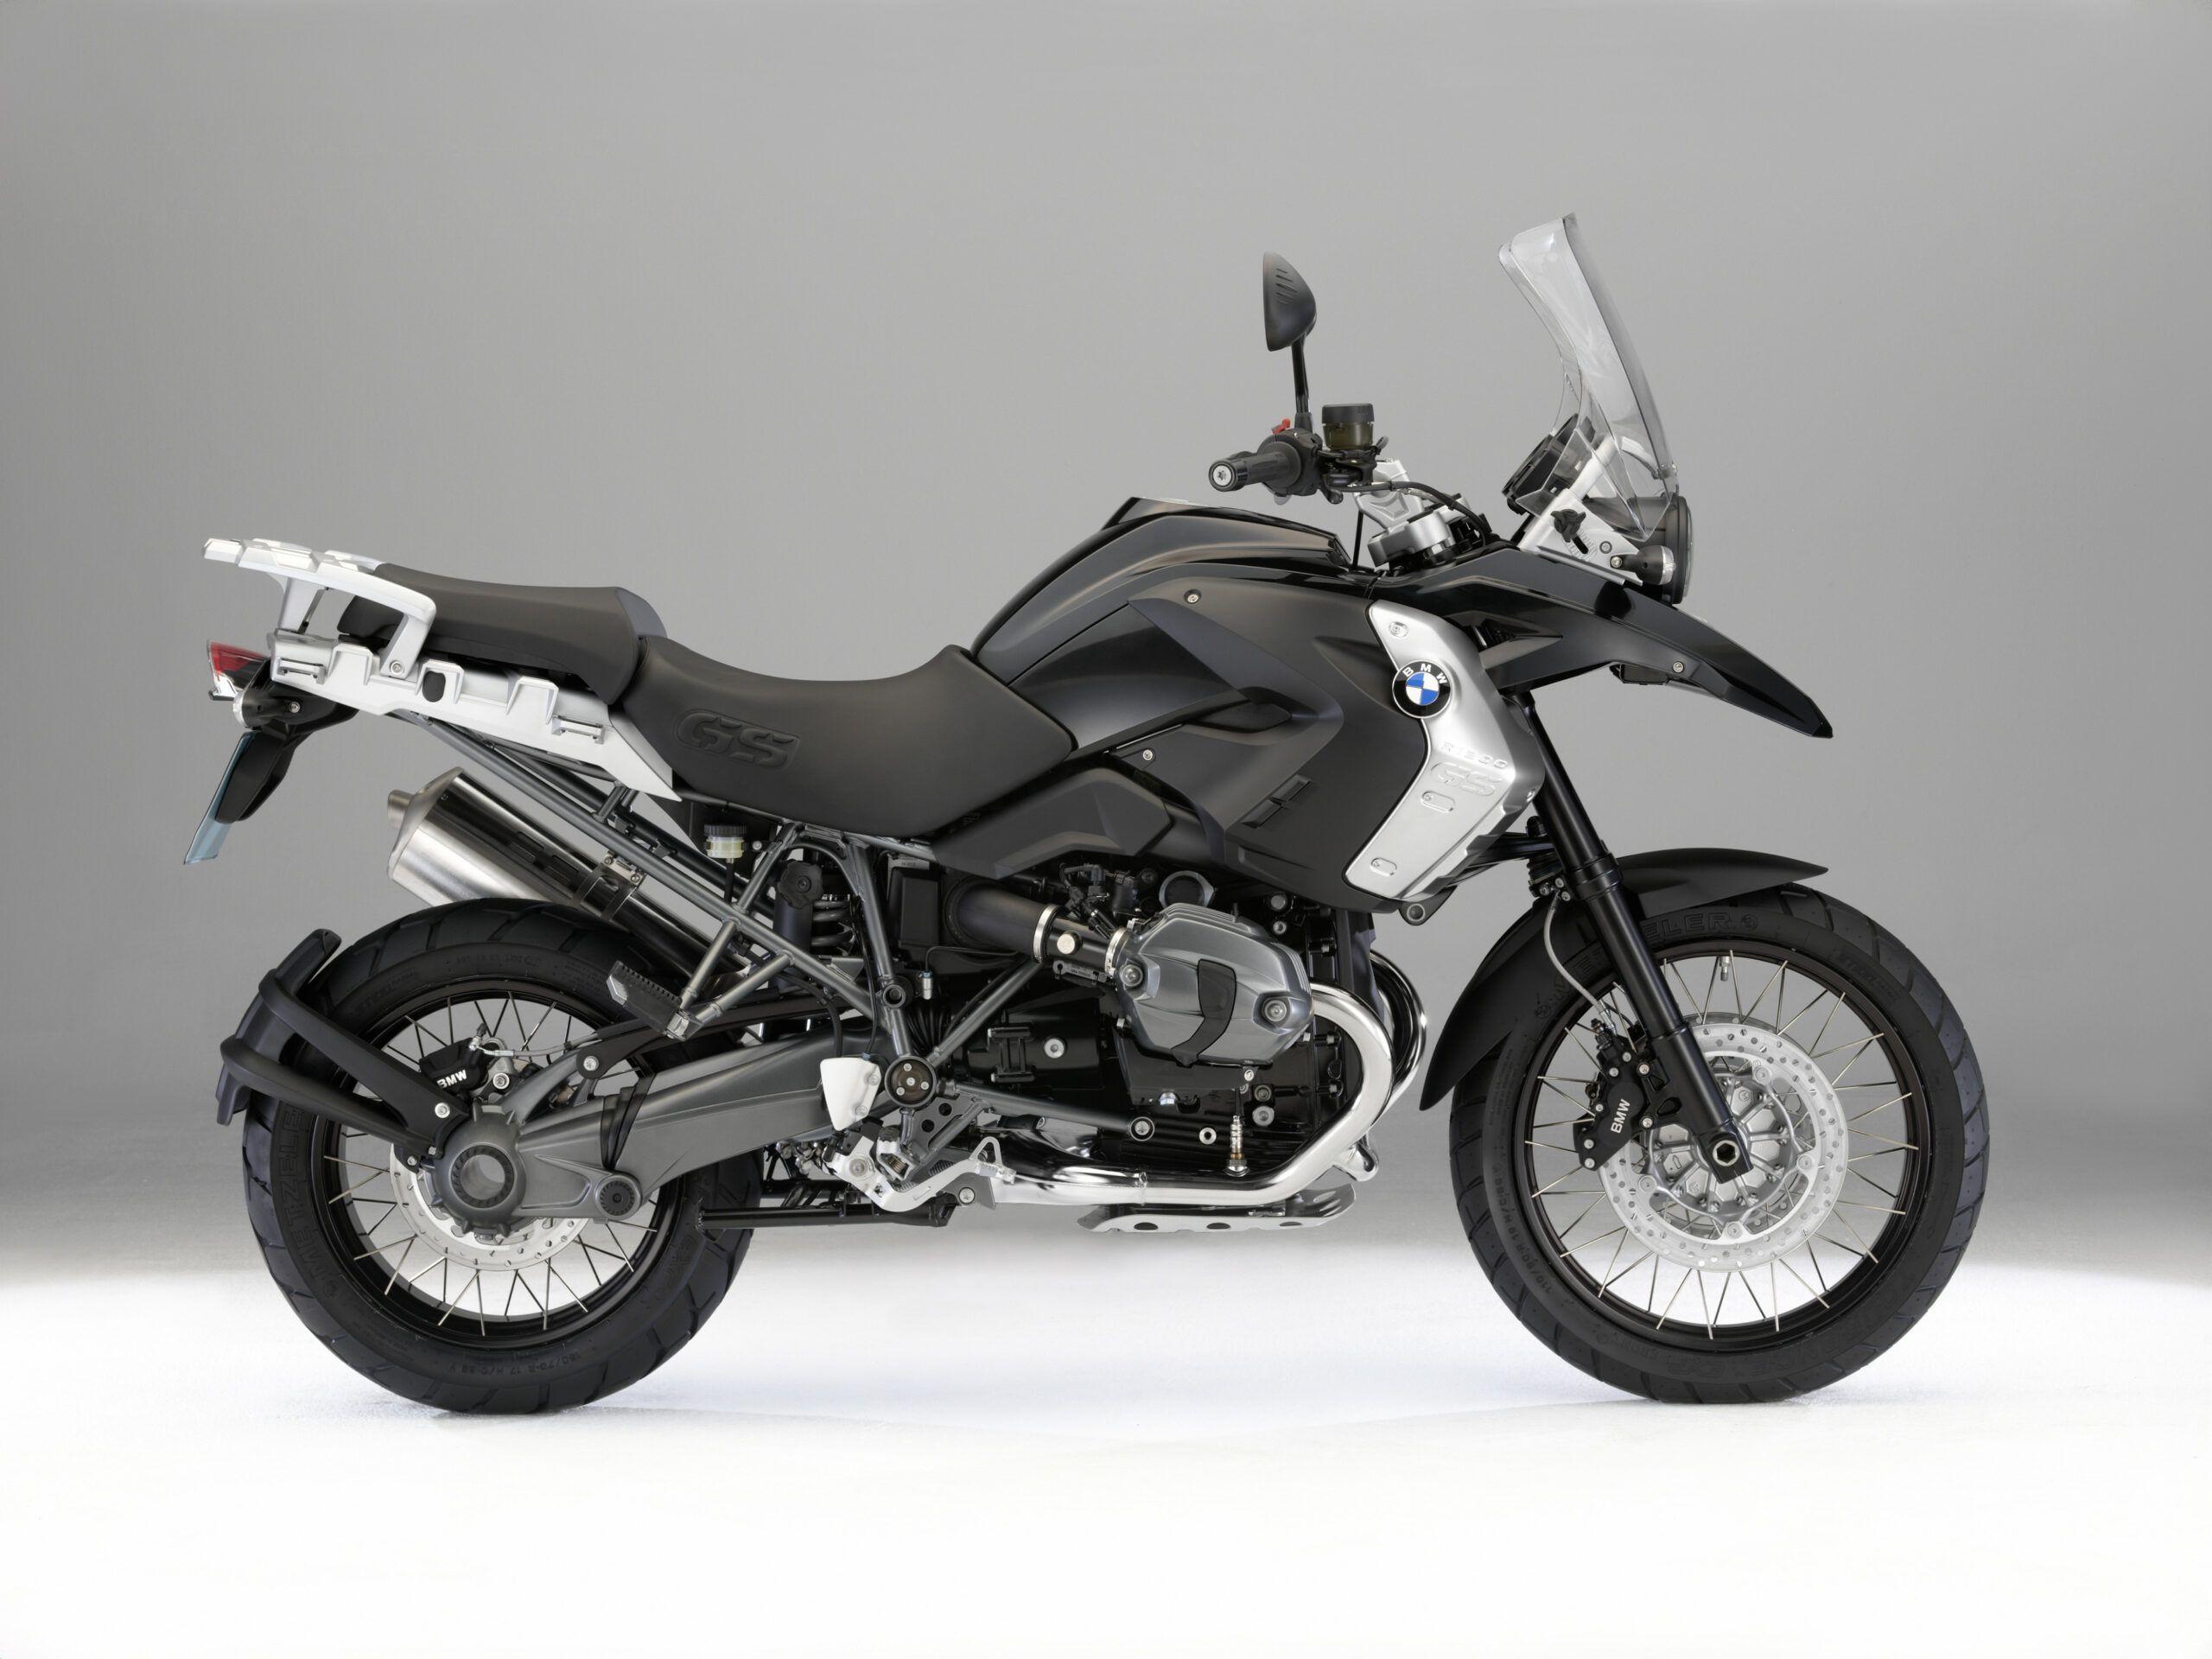 2020 Bmw R1200gs Triple Black In 2020 Bmw Bmw Motorcycles Triple Black